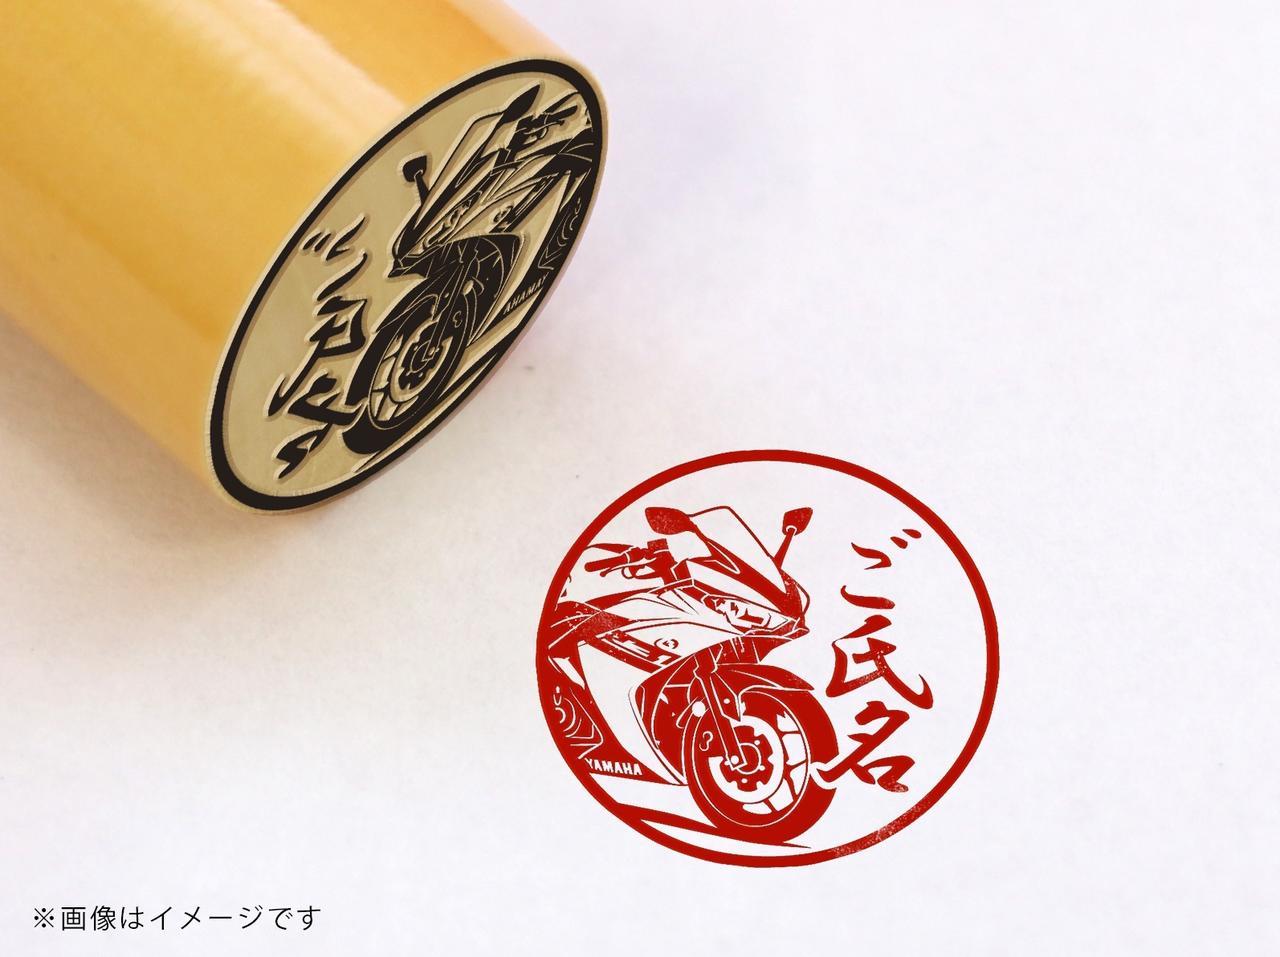 Images : 【YAMAHA】YZF-R3・柘植丸印18mm